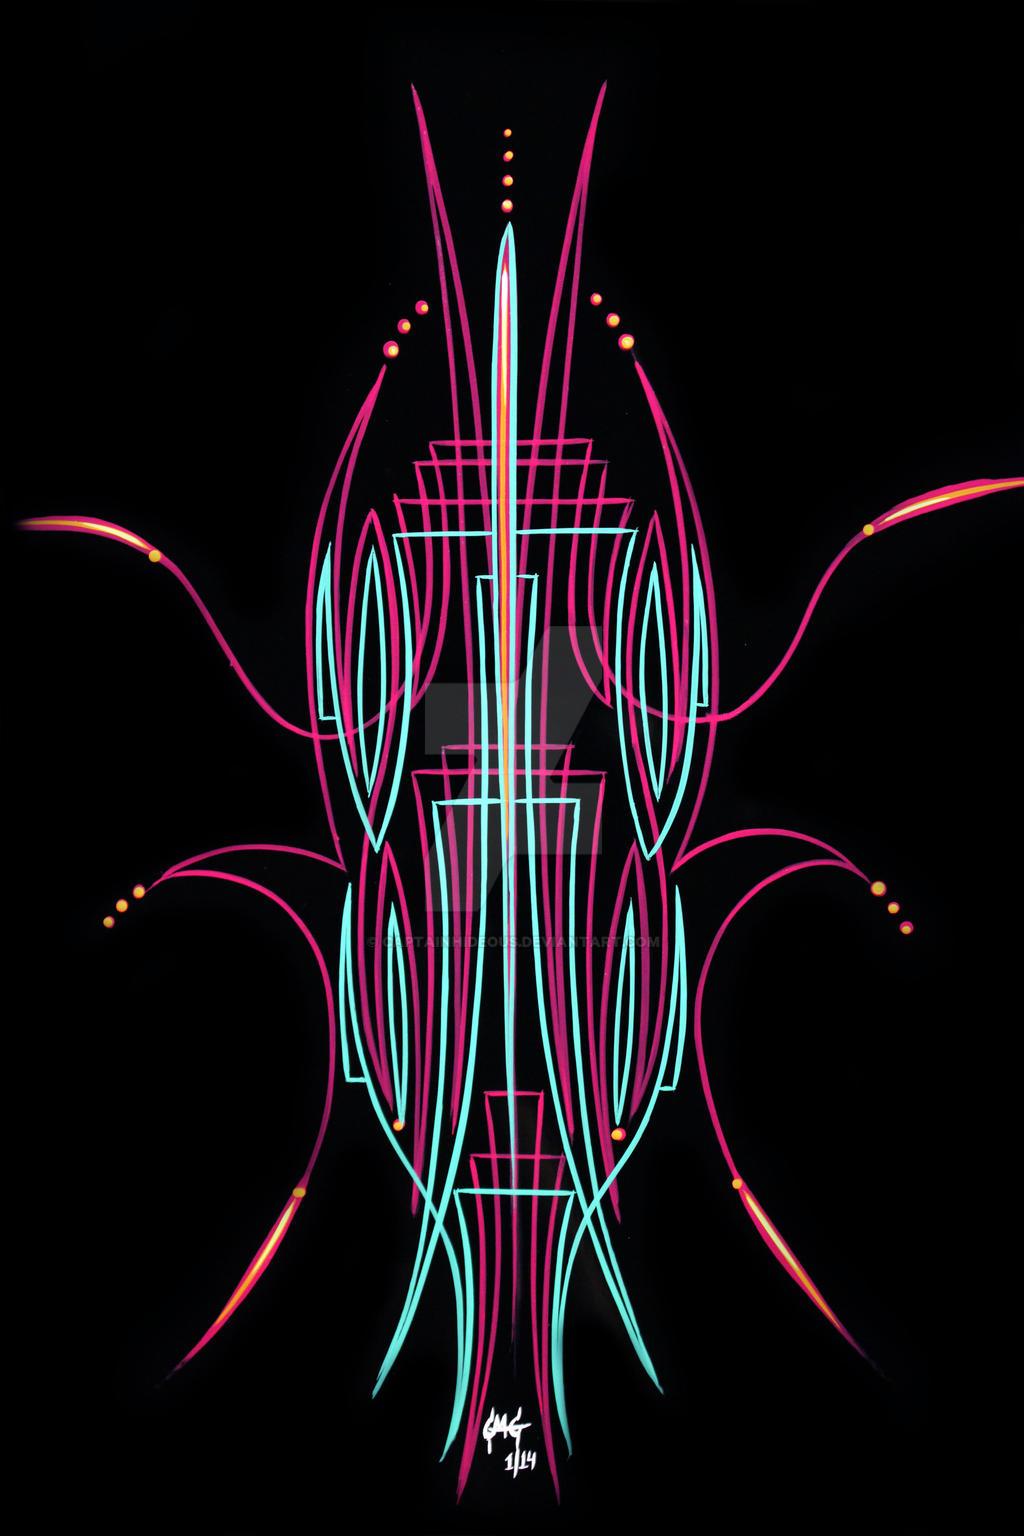 Old Skool Pinstripe Designs 2 By Captainhideous On Deviantart